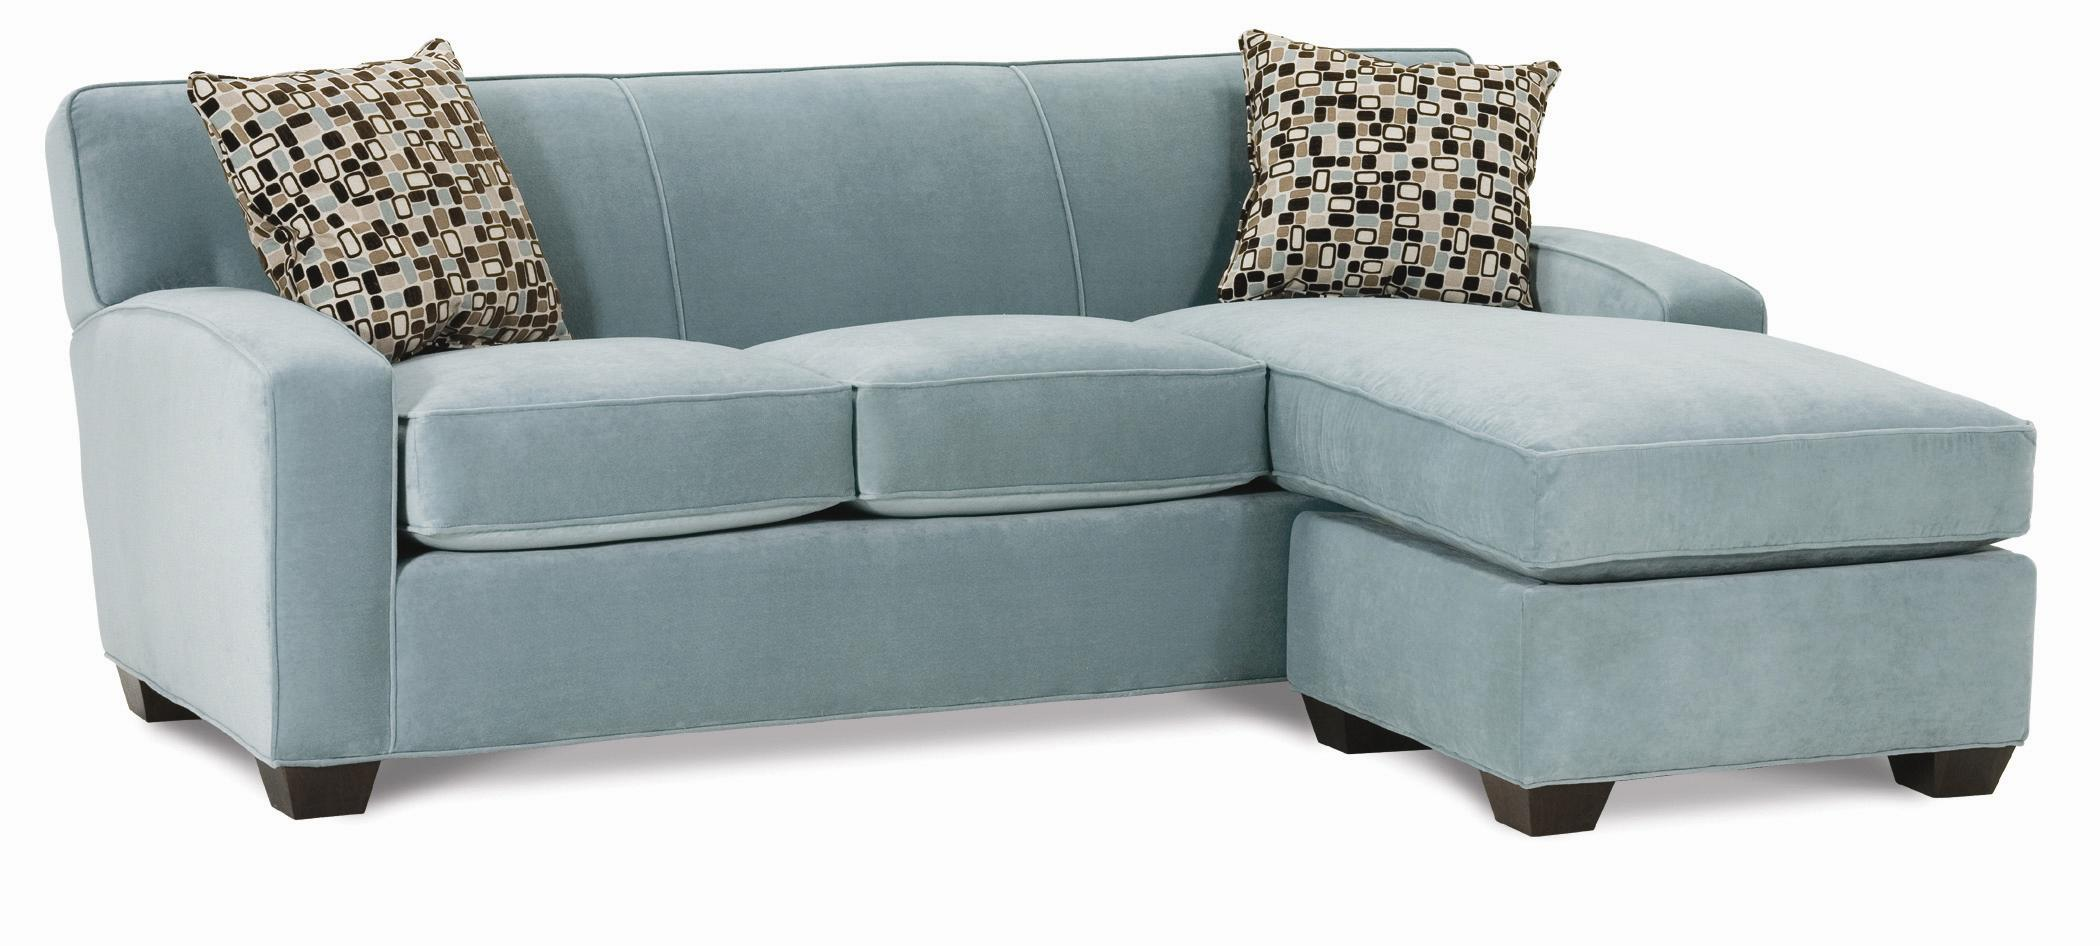 Rowe Horizon Stationary Sectional Sofa with Chaise AHFA Sofa